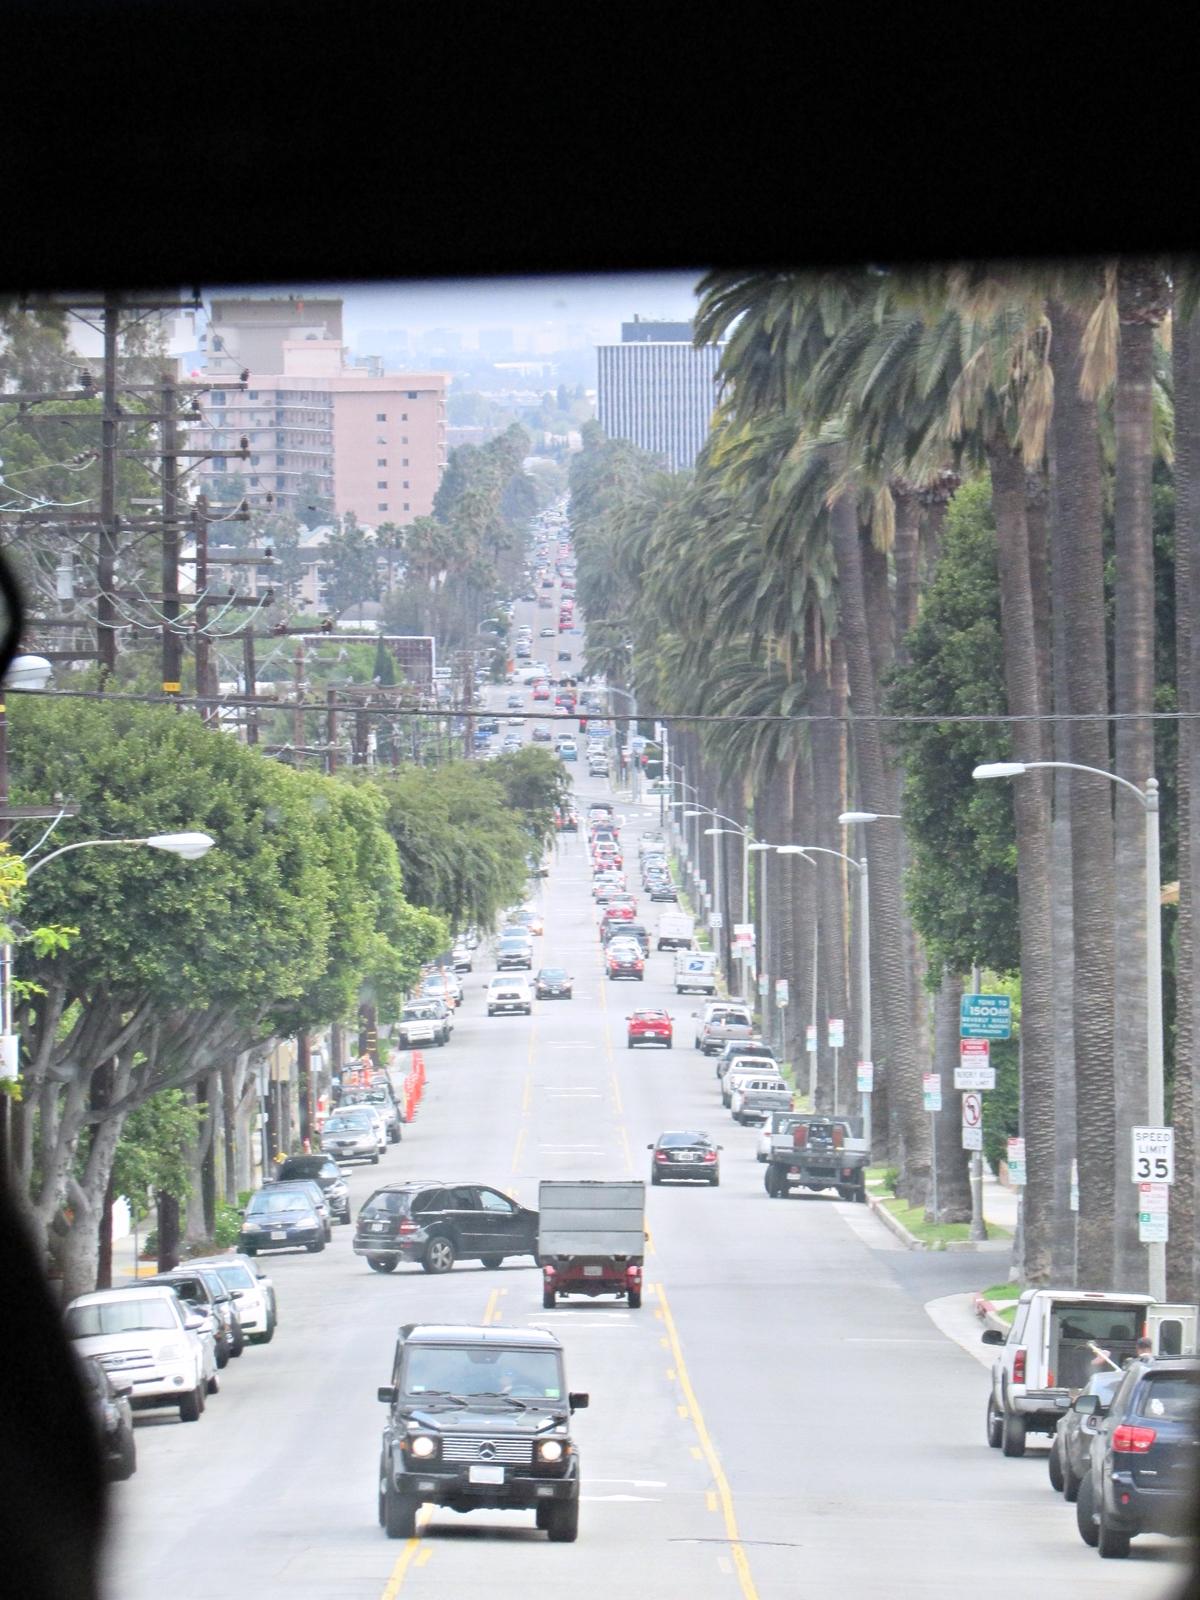 Beverly Hills - USA Roadtrip - Amerika Rundreise - Fashionladyloves by Tamara Wagner Travelblog